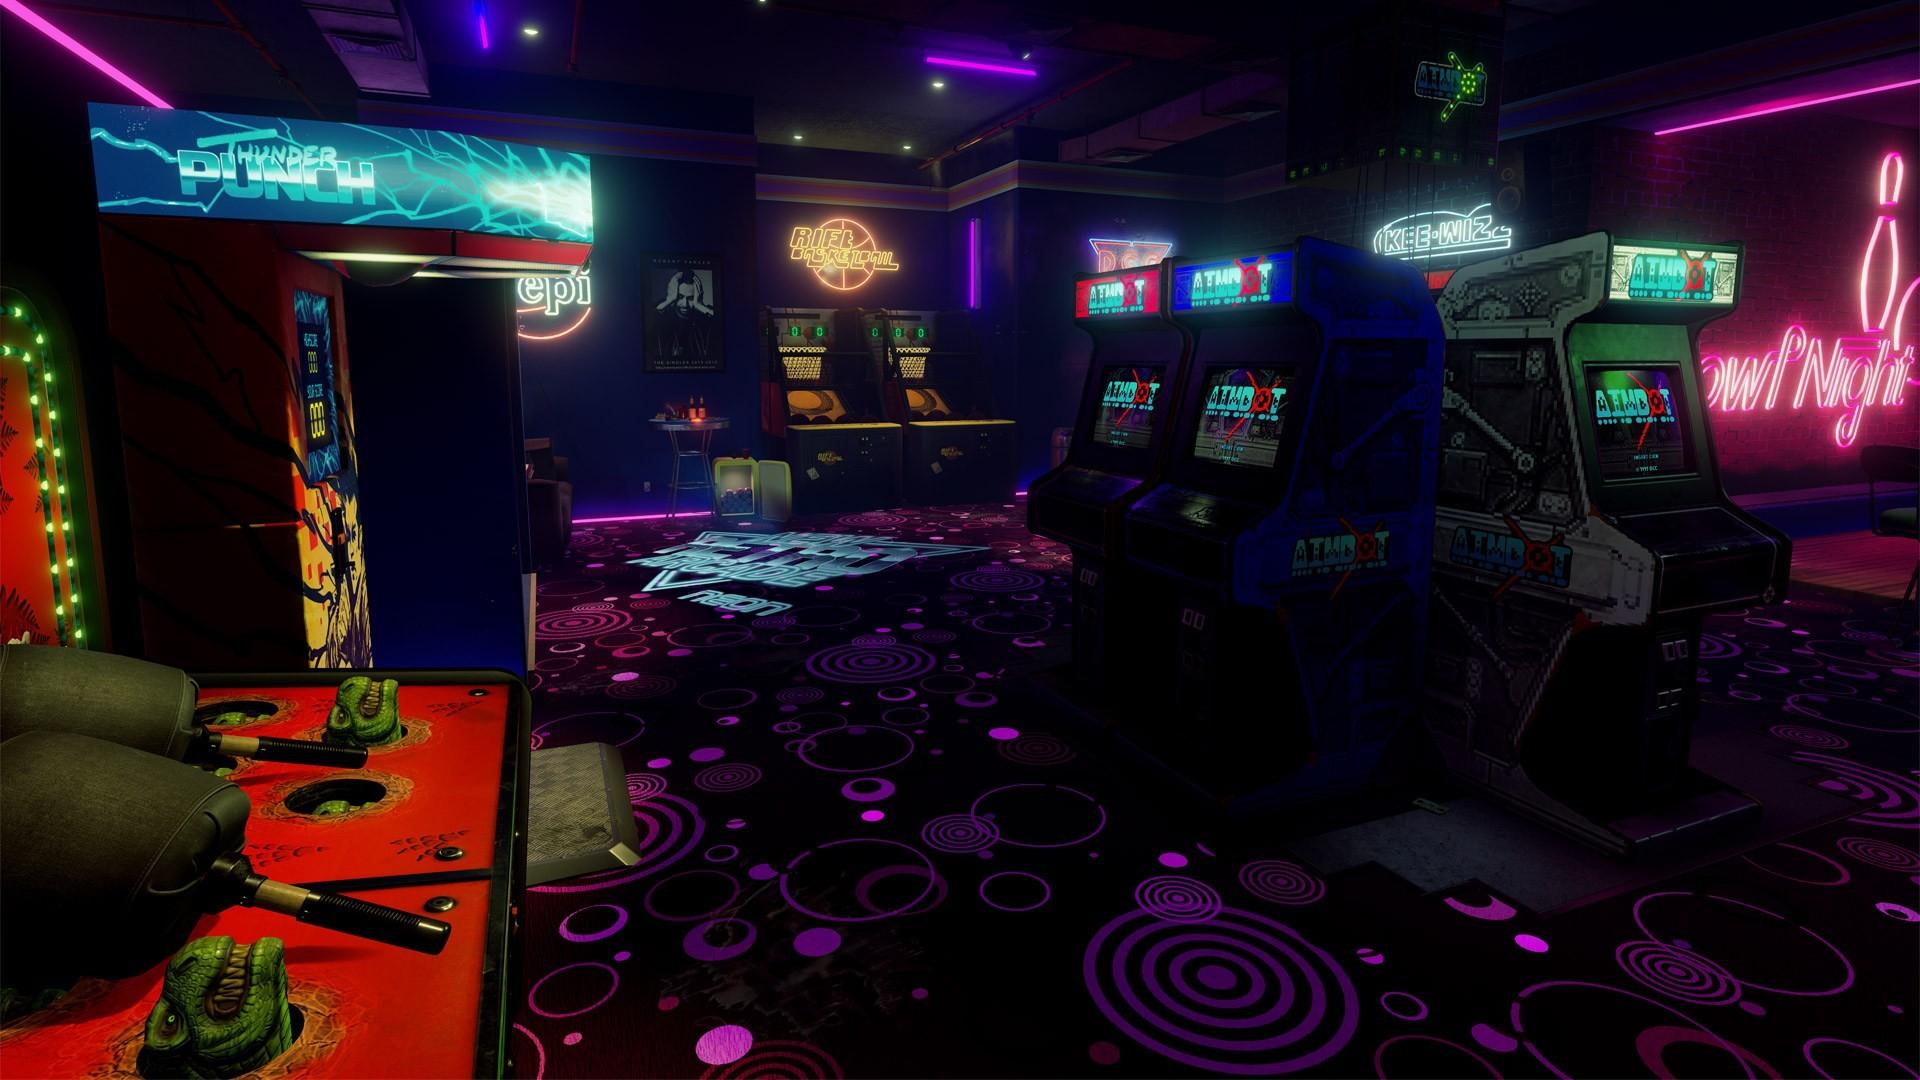 'New Retro Arcade: Neon' is a Classic Arcade Gamer Paradise